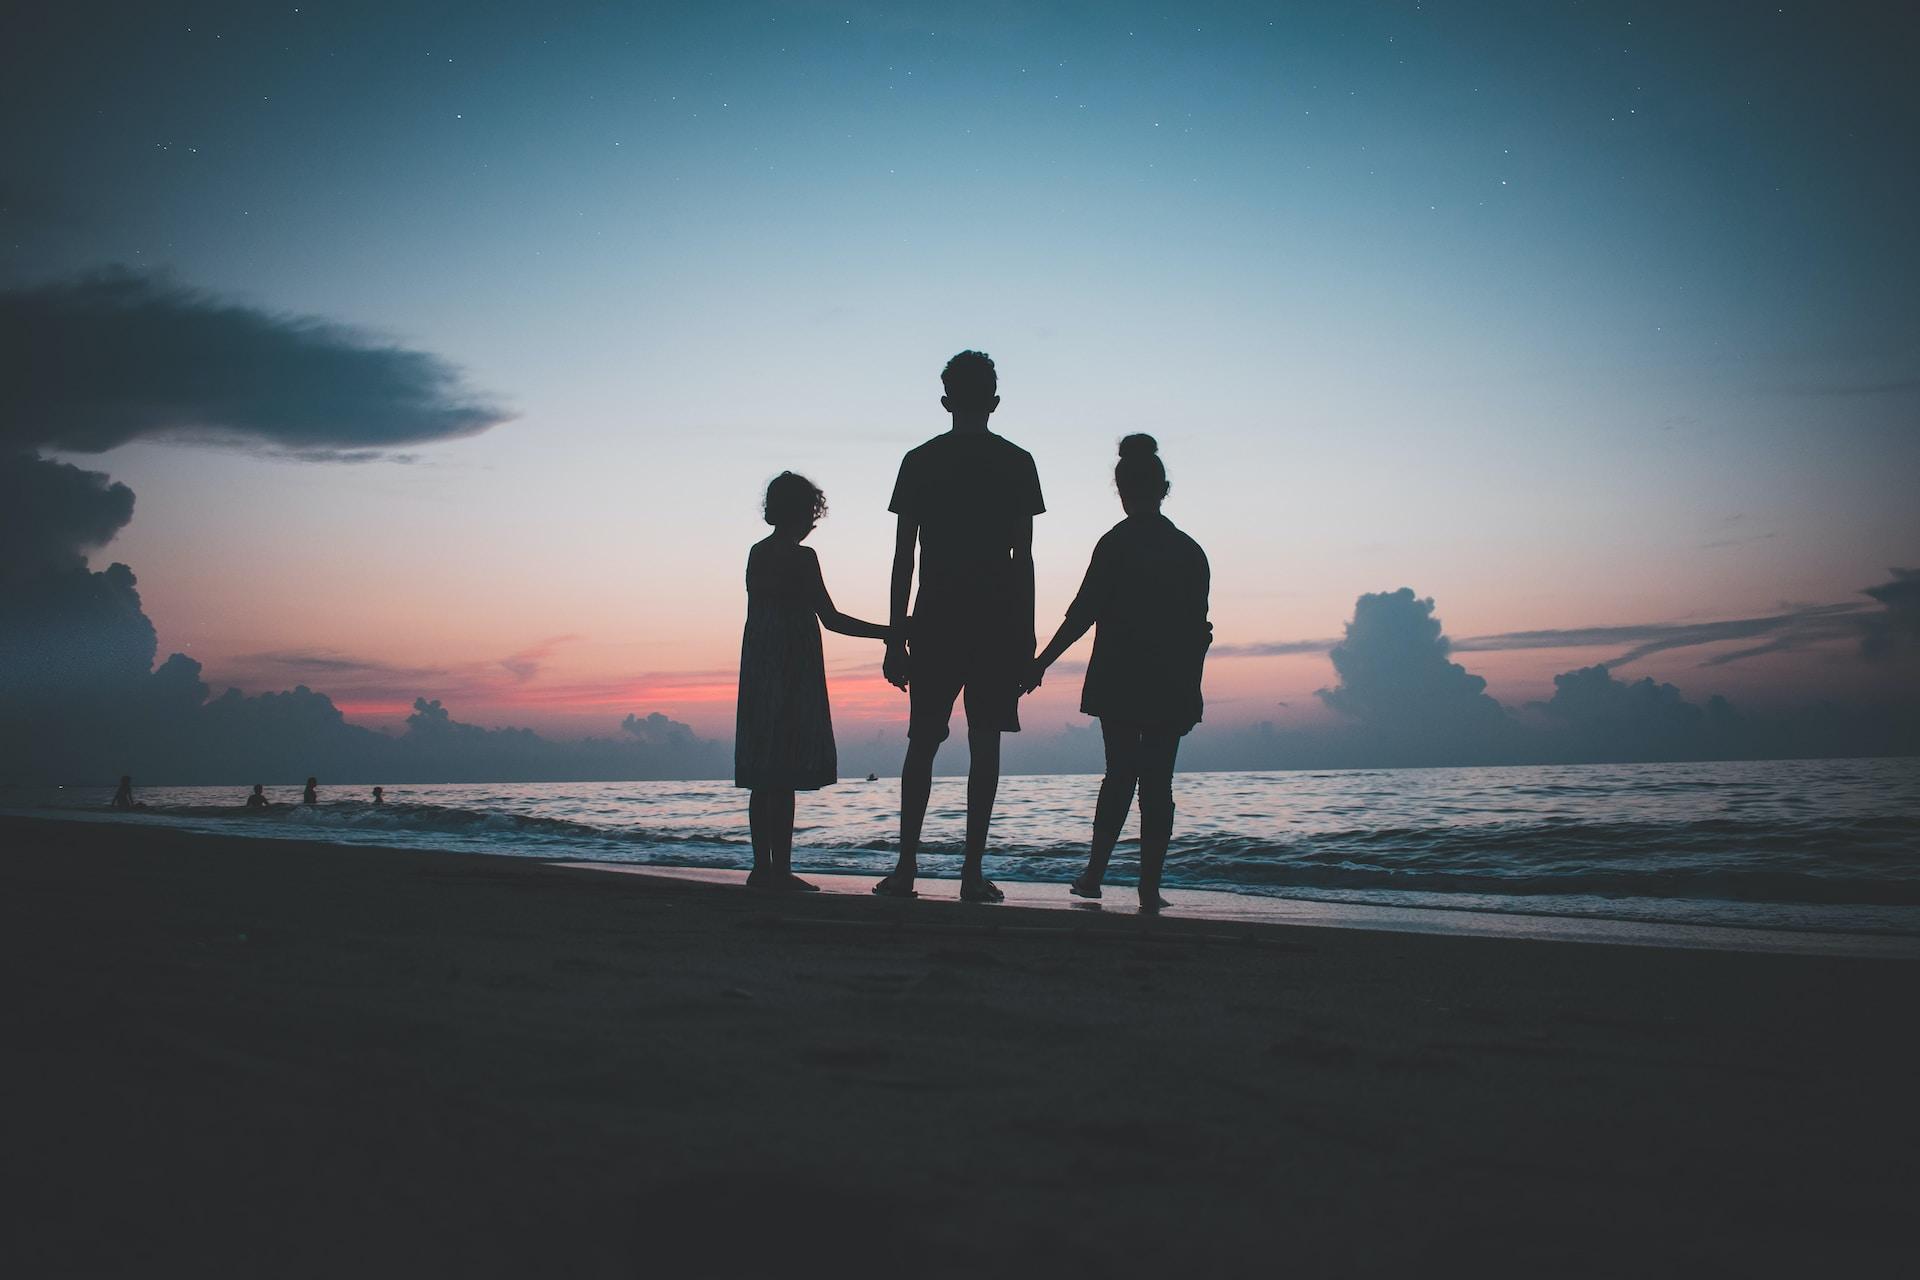 silhouette of three people walking beside body of water